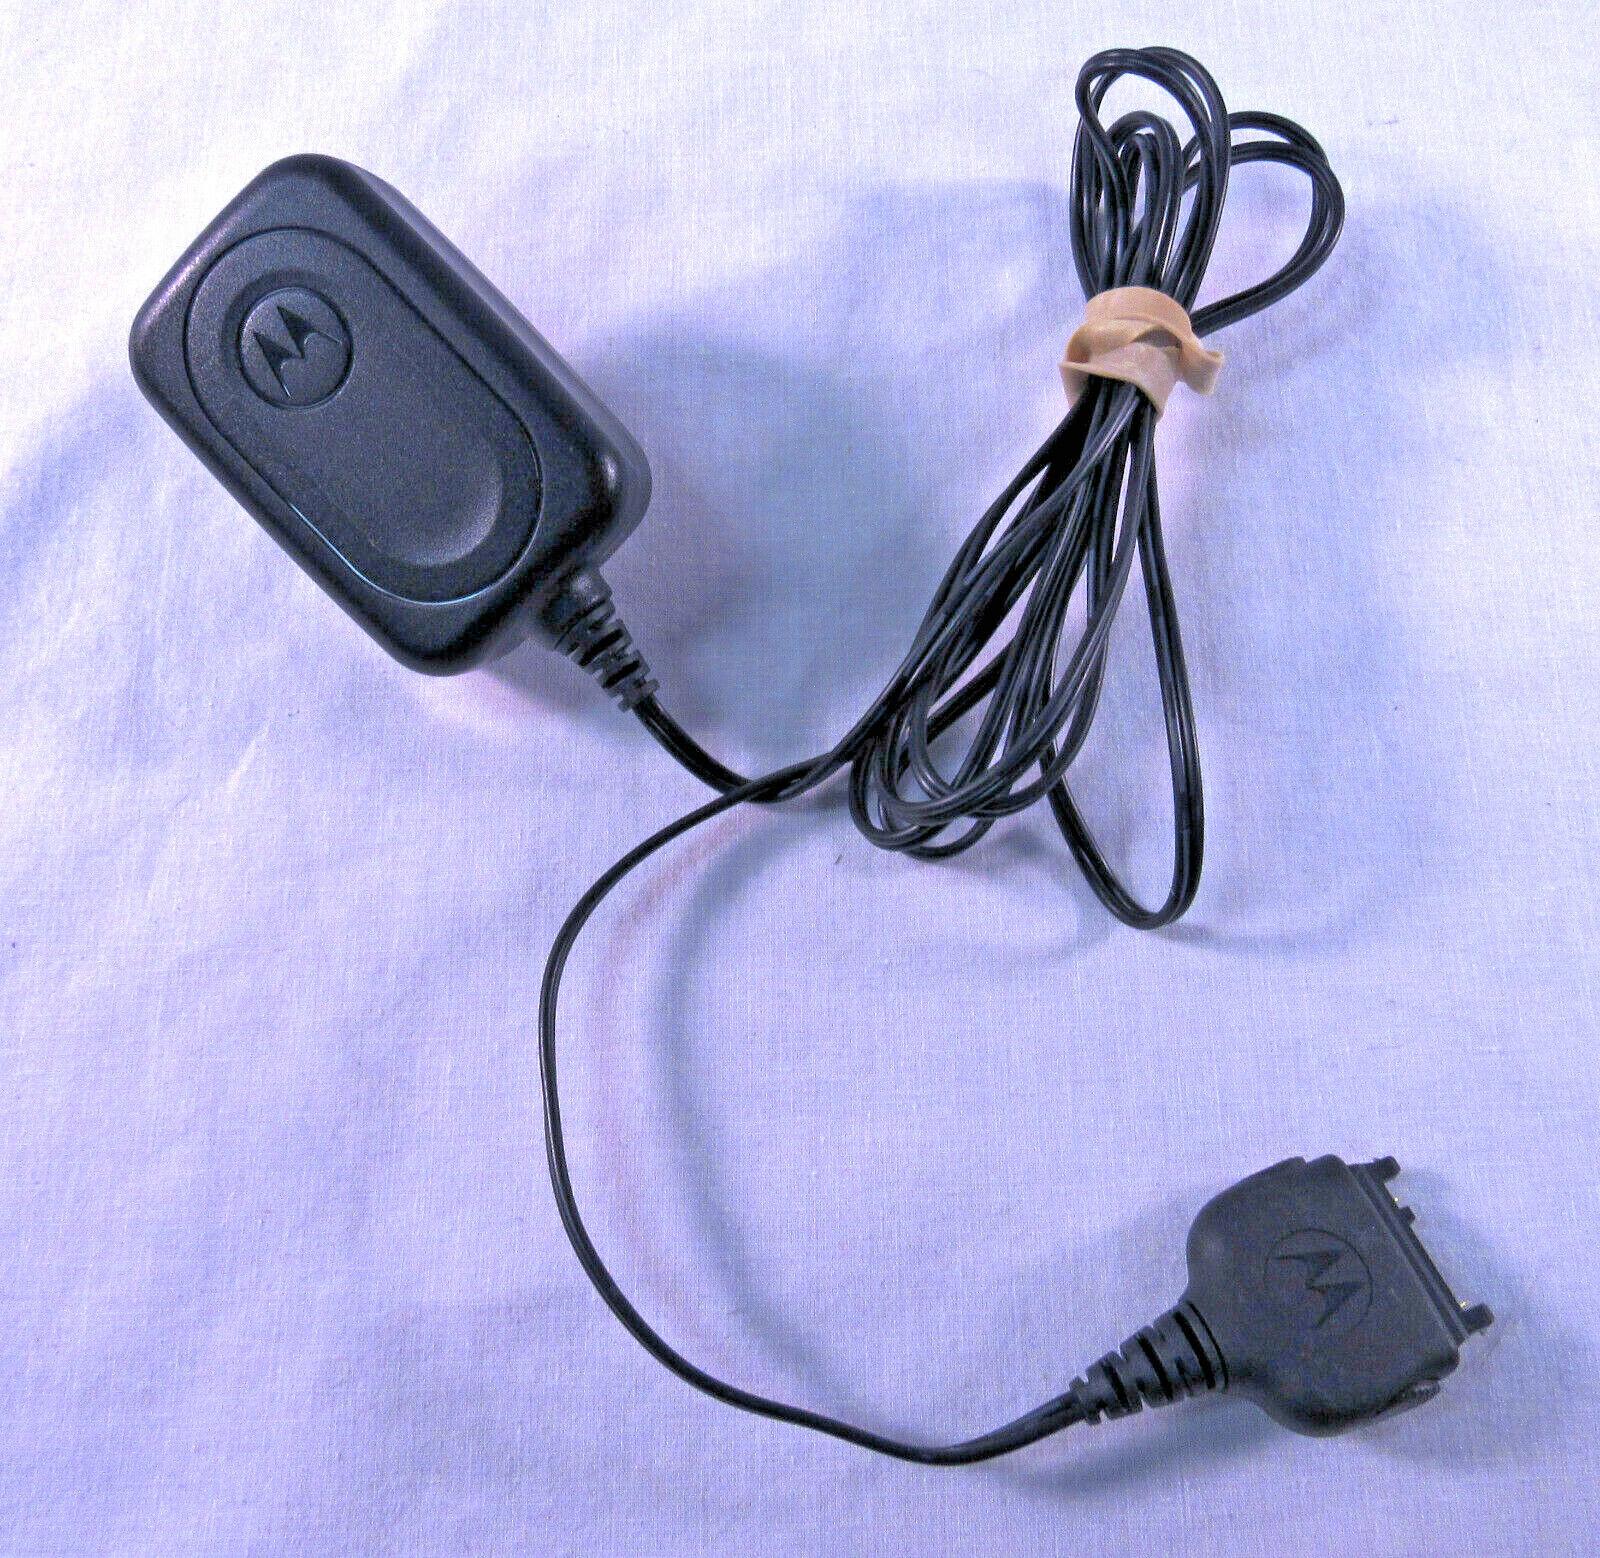 Vintage Motorola brand power Adapter, 100 ~240VAC, 50~60Hz, to 5VDC , 800mA